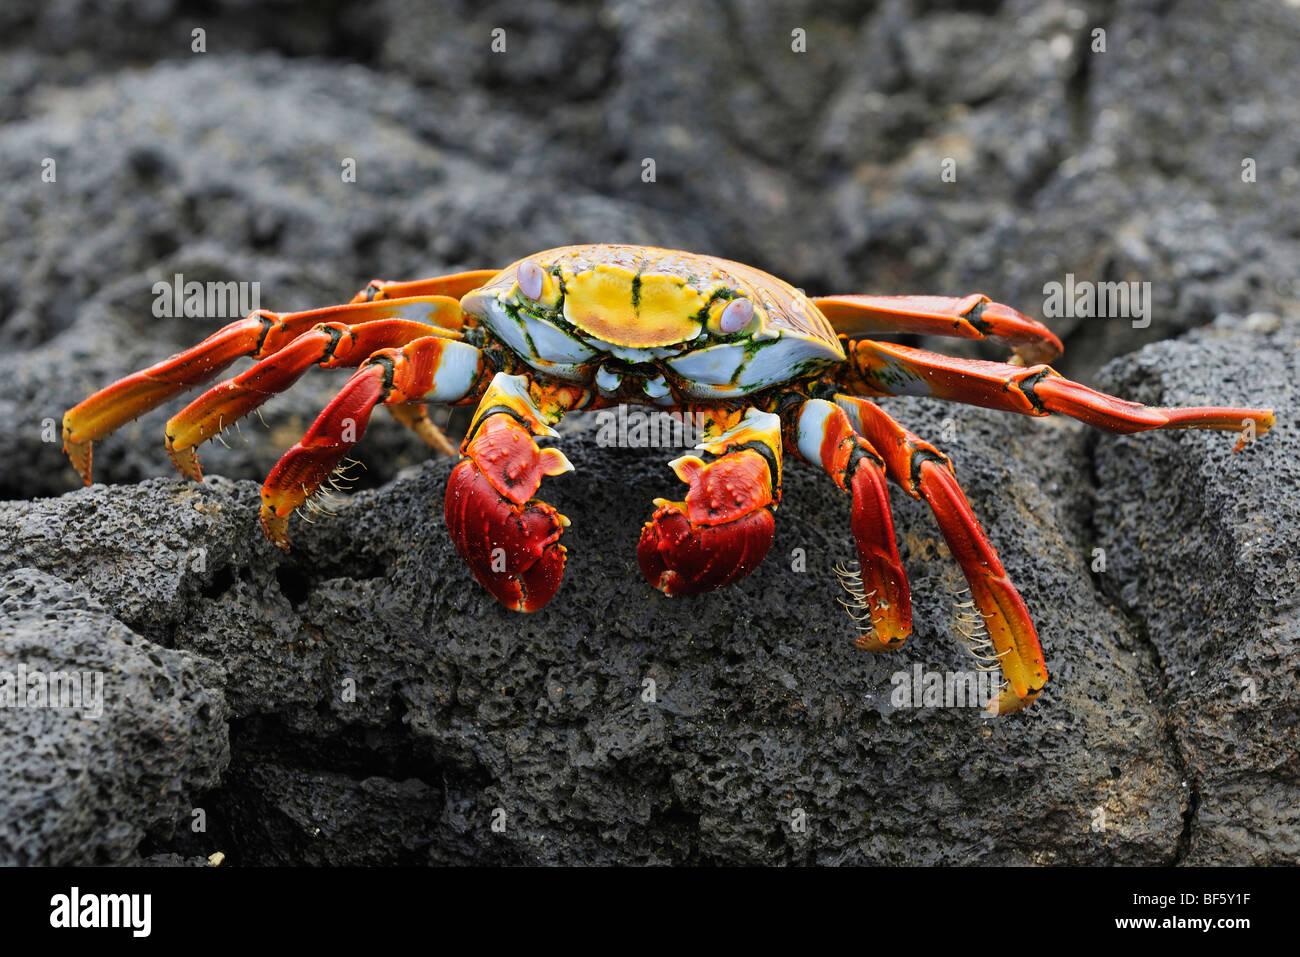 Sally Lightfoot Crab (Grapsus grapsus), adult, Espa ola Island, Galapagos, Ecuador, South America - Stock Image